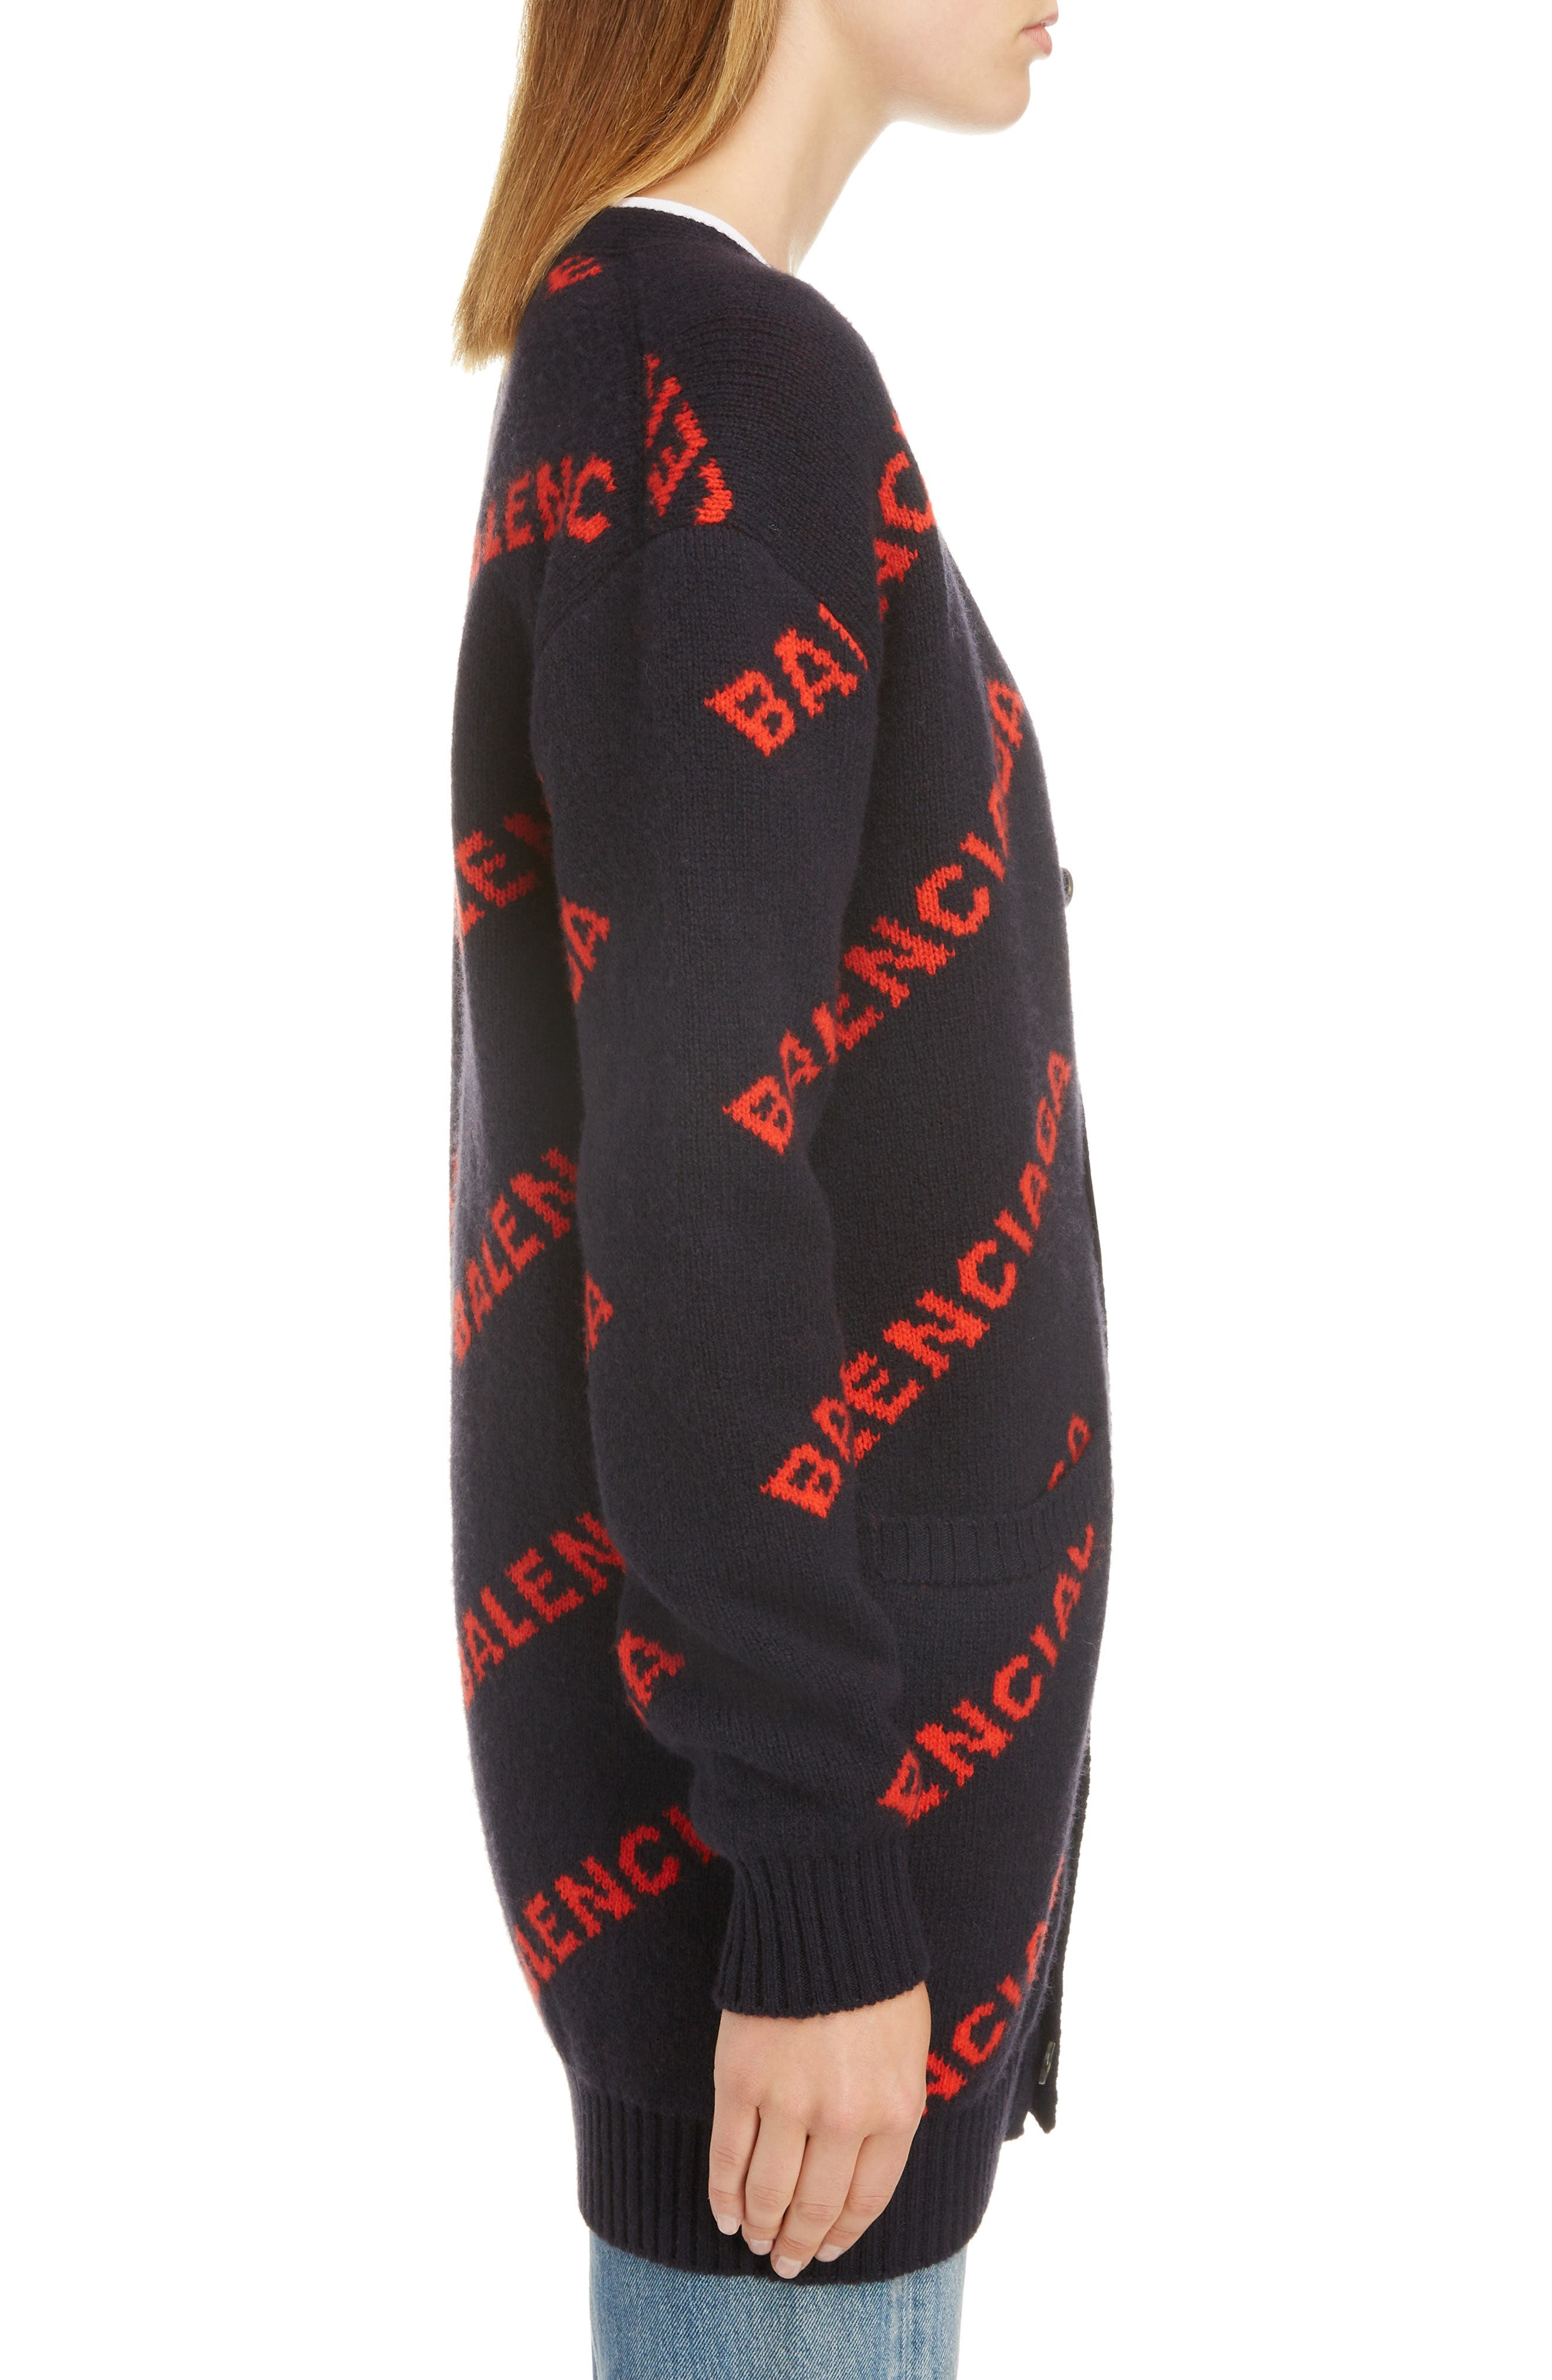 BALENCIAGA, Logo Jacquard Wool Blend Cardigan, Alternate thumbnail 3, color, NAVY/ ORANGE